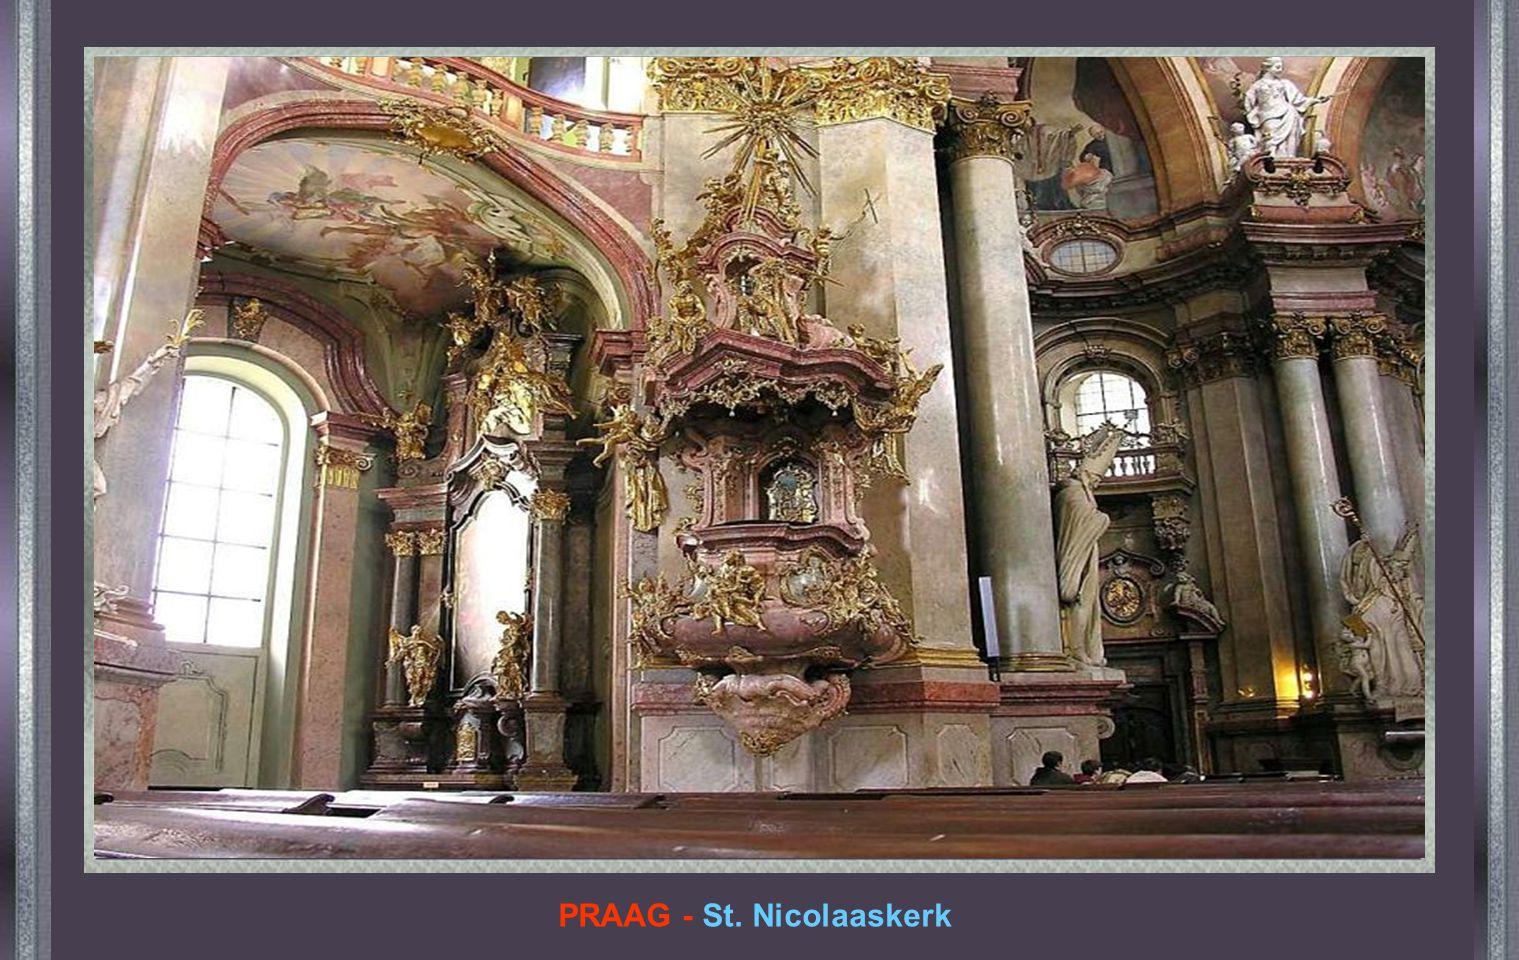 PRAAG - St. Nicolaaskerk